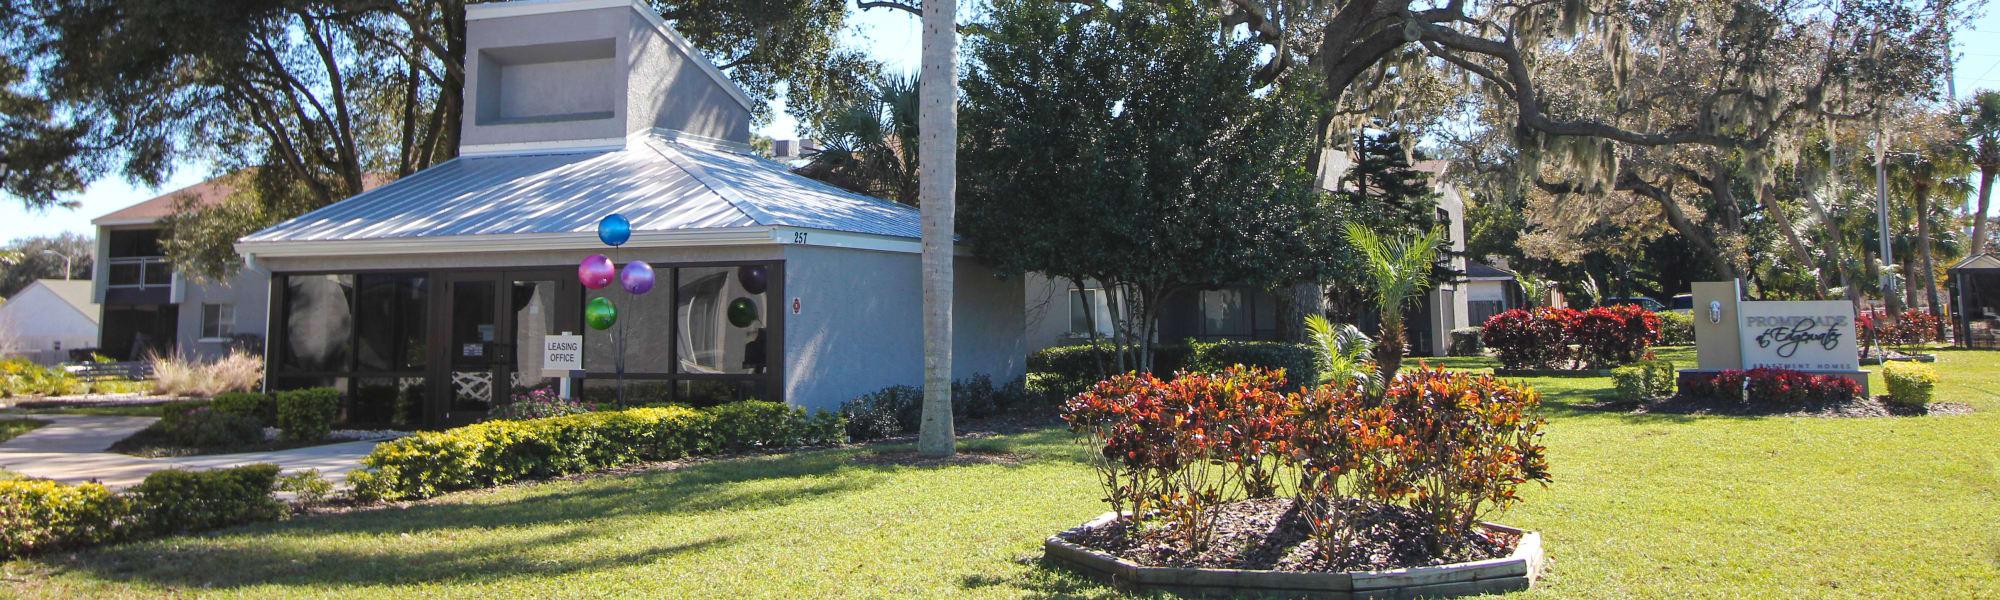 Promenade at Edgewater leasing office in Dunedin, Florida